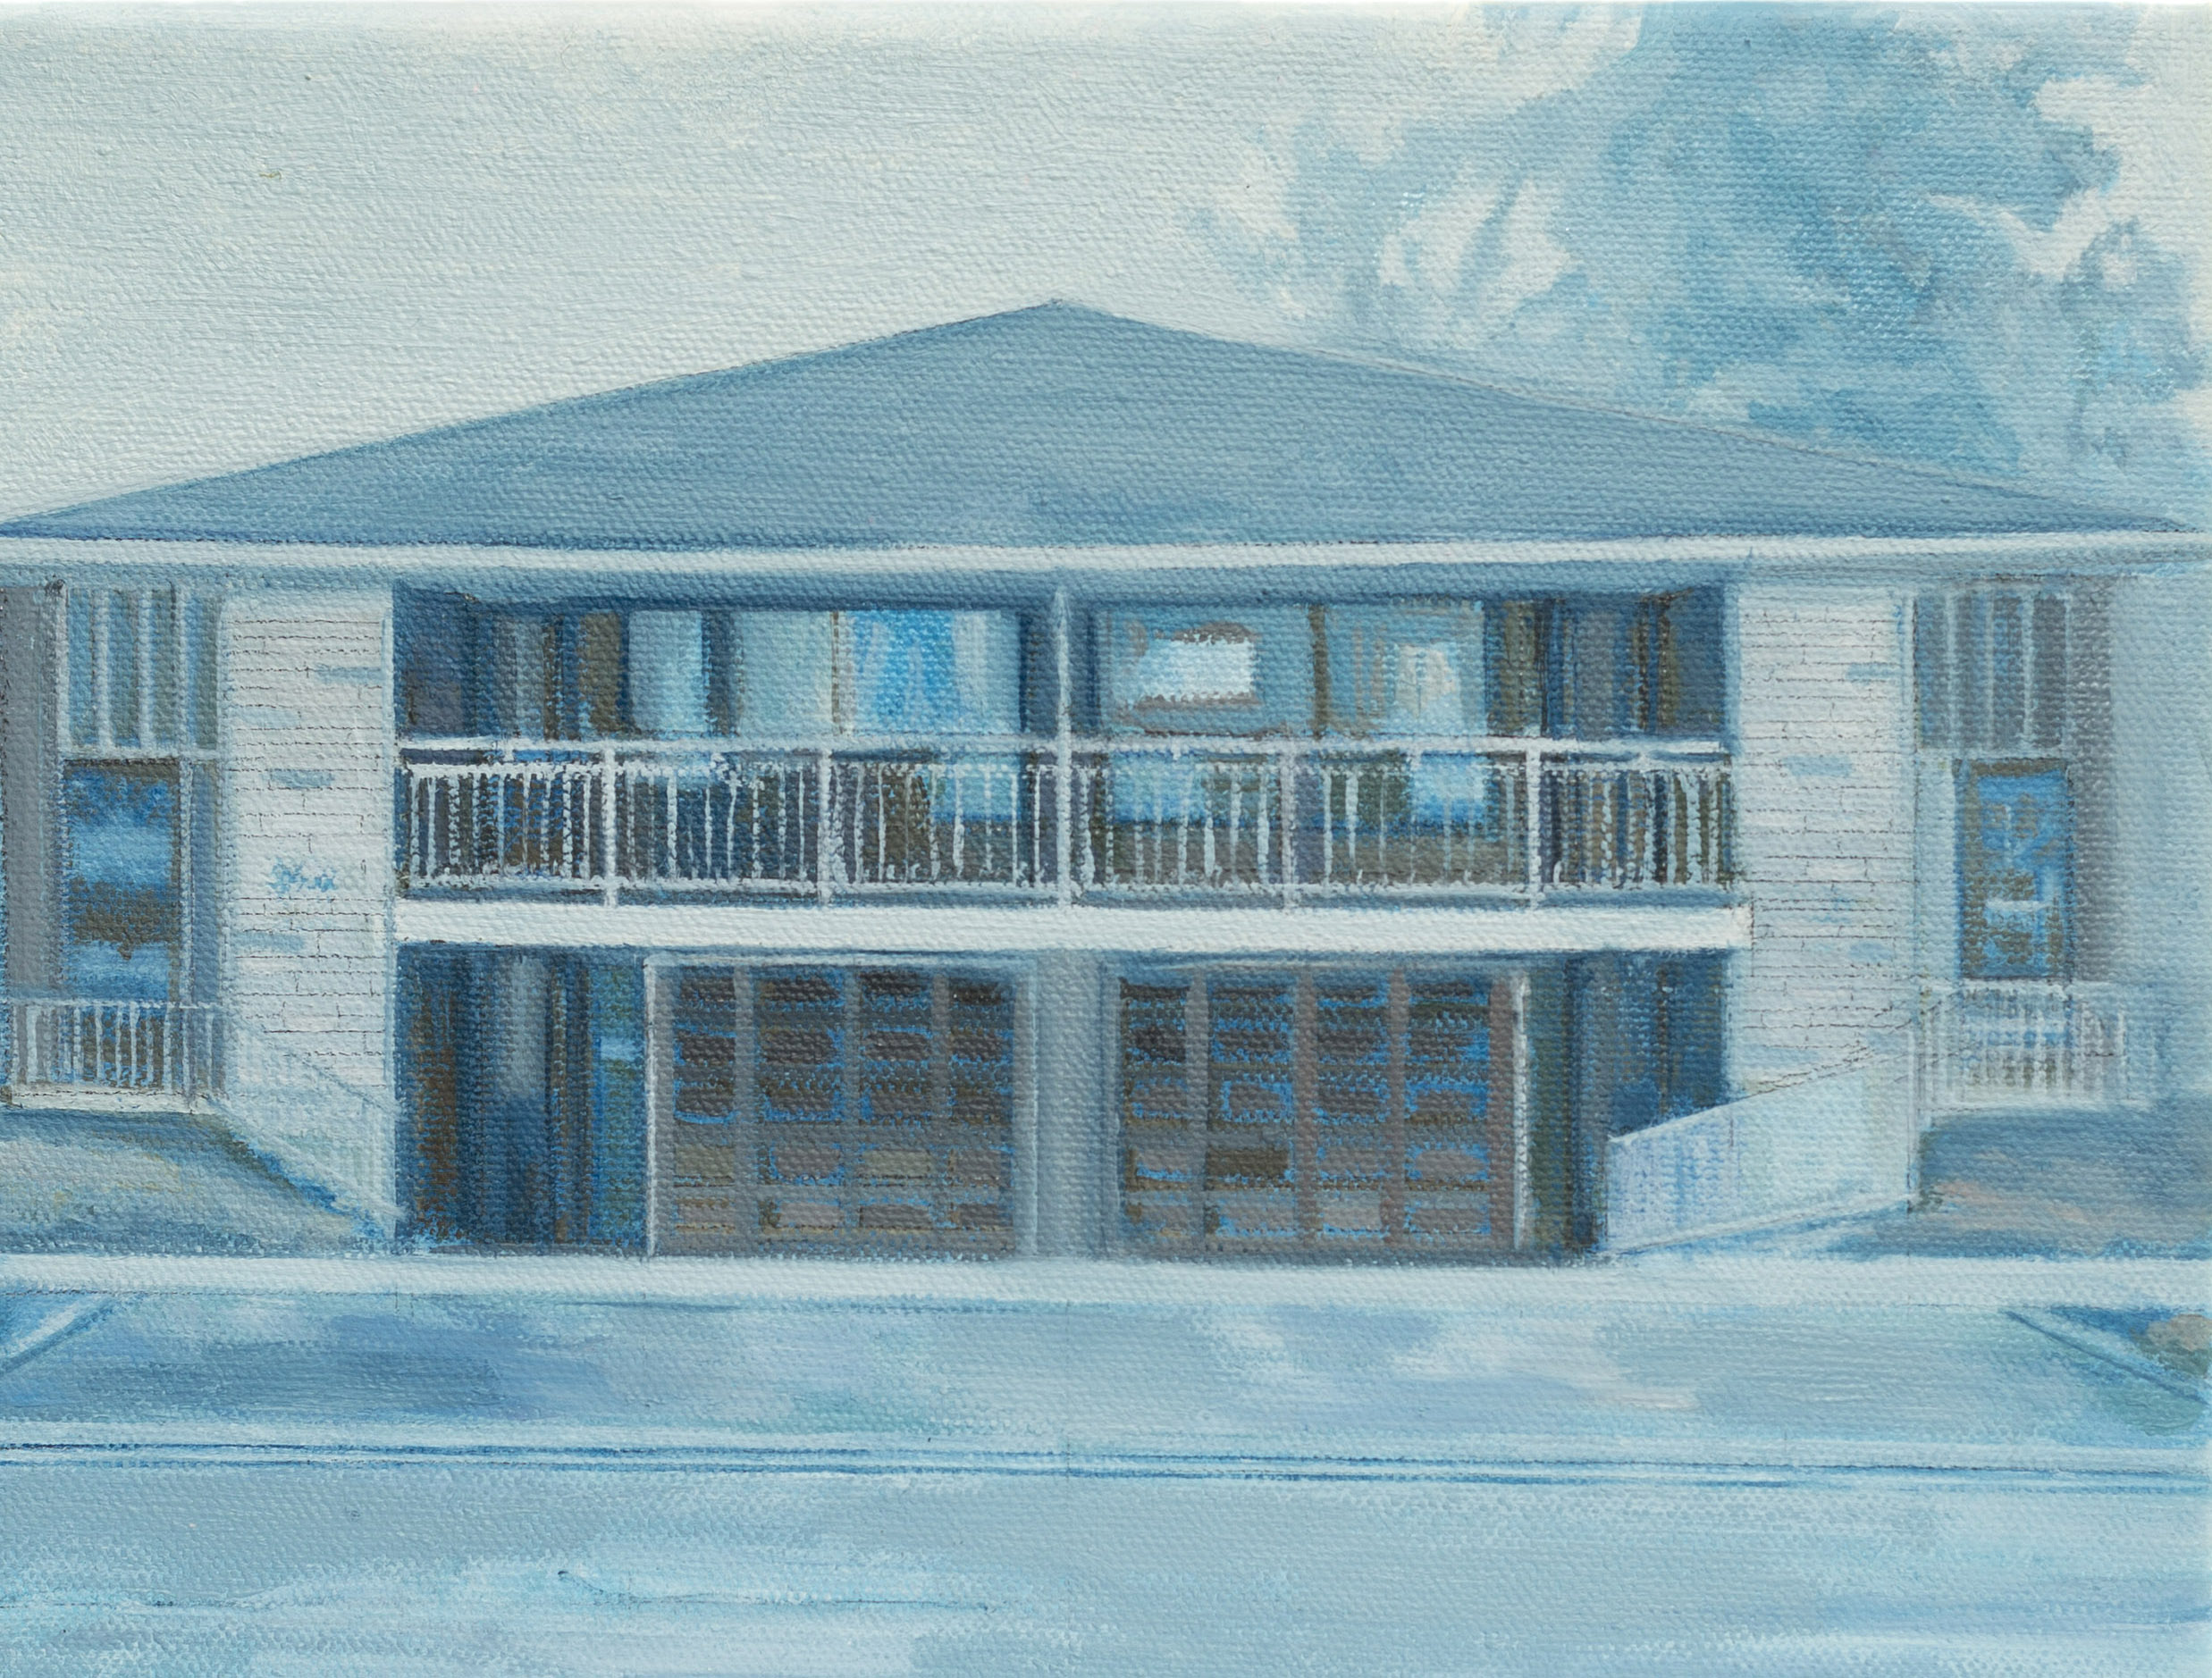 Suburban House, 2015, oil on canvas, 8 x 10 in.